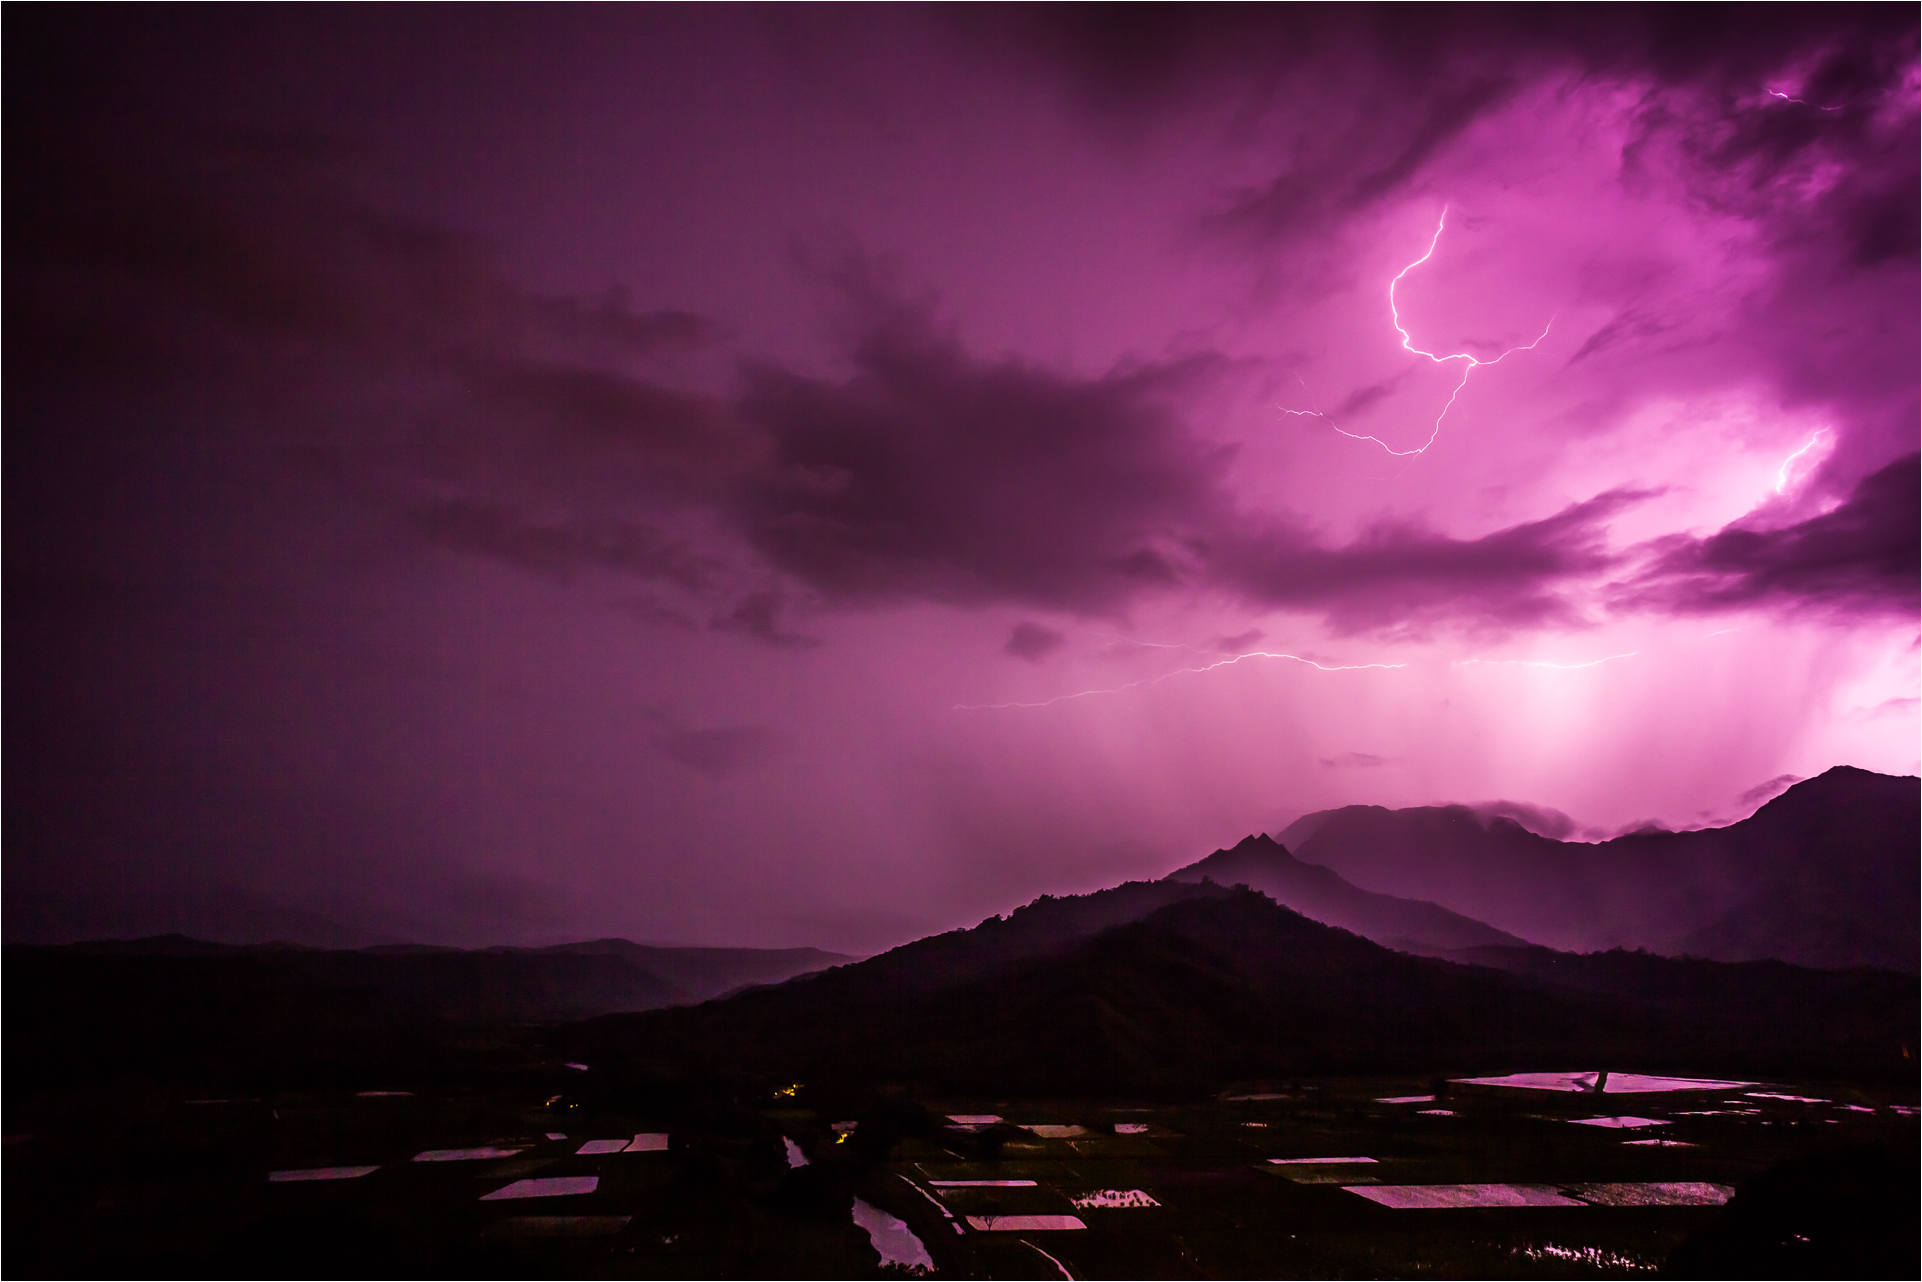 Sparks from Pele's anvil - © Christopher Martin-0002